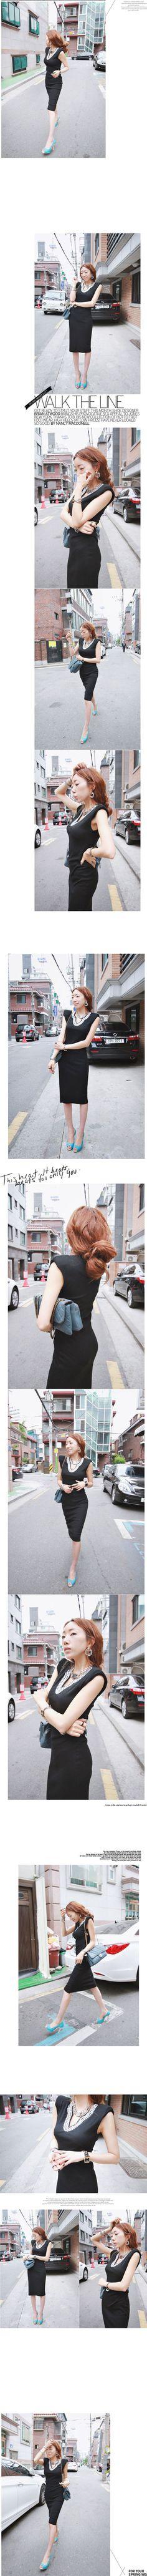 Beautiful evening dress,hot selling,if you like,pls contact us. http://www.aliexpress.com/store/1197212..